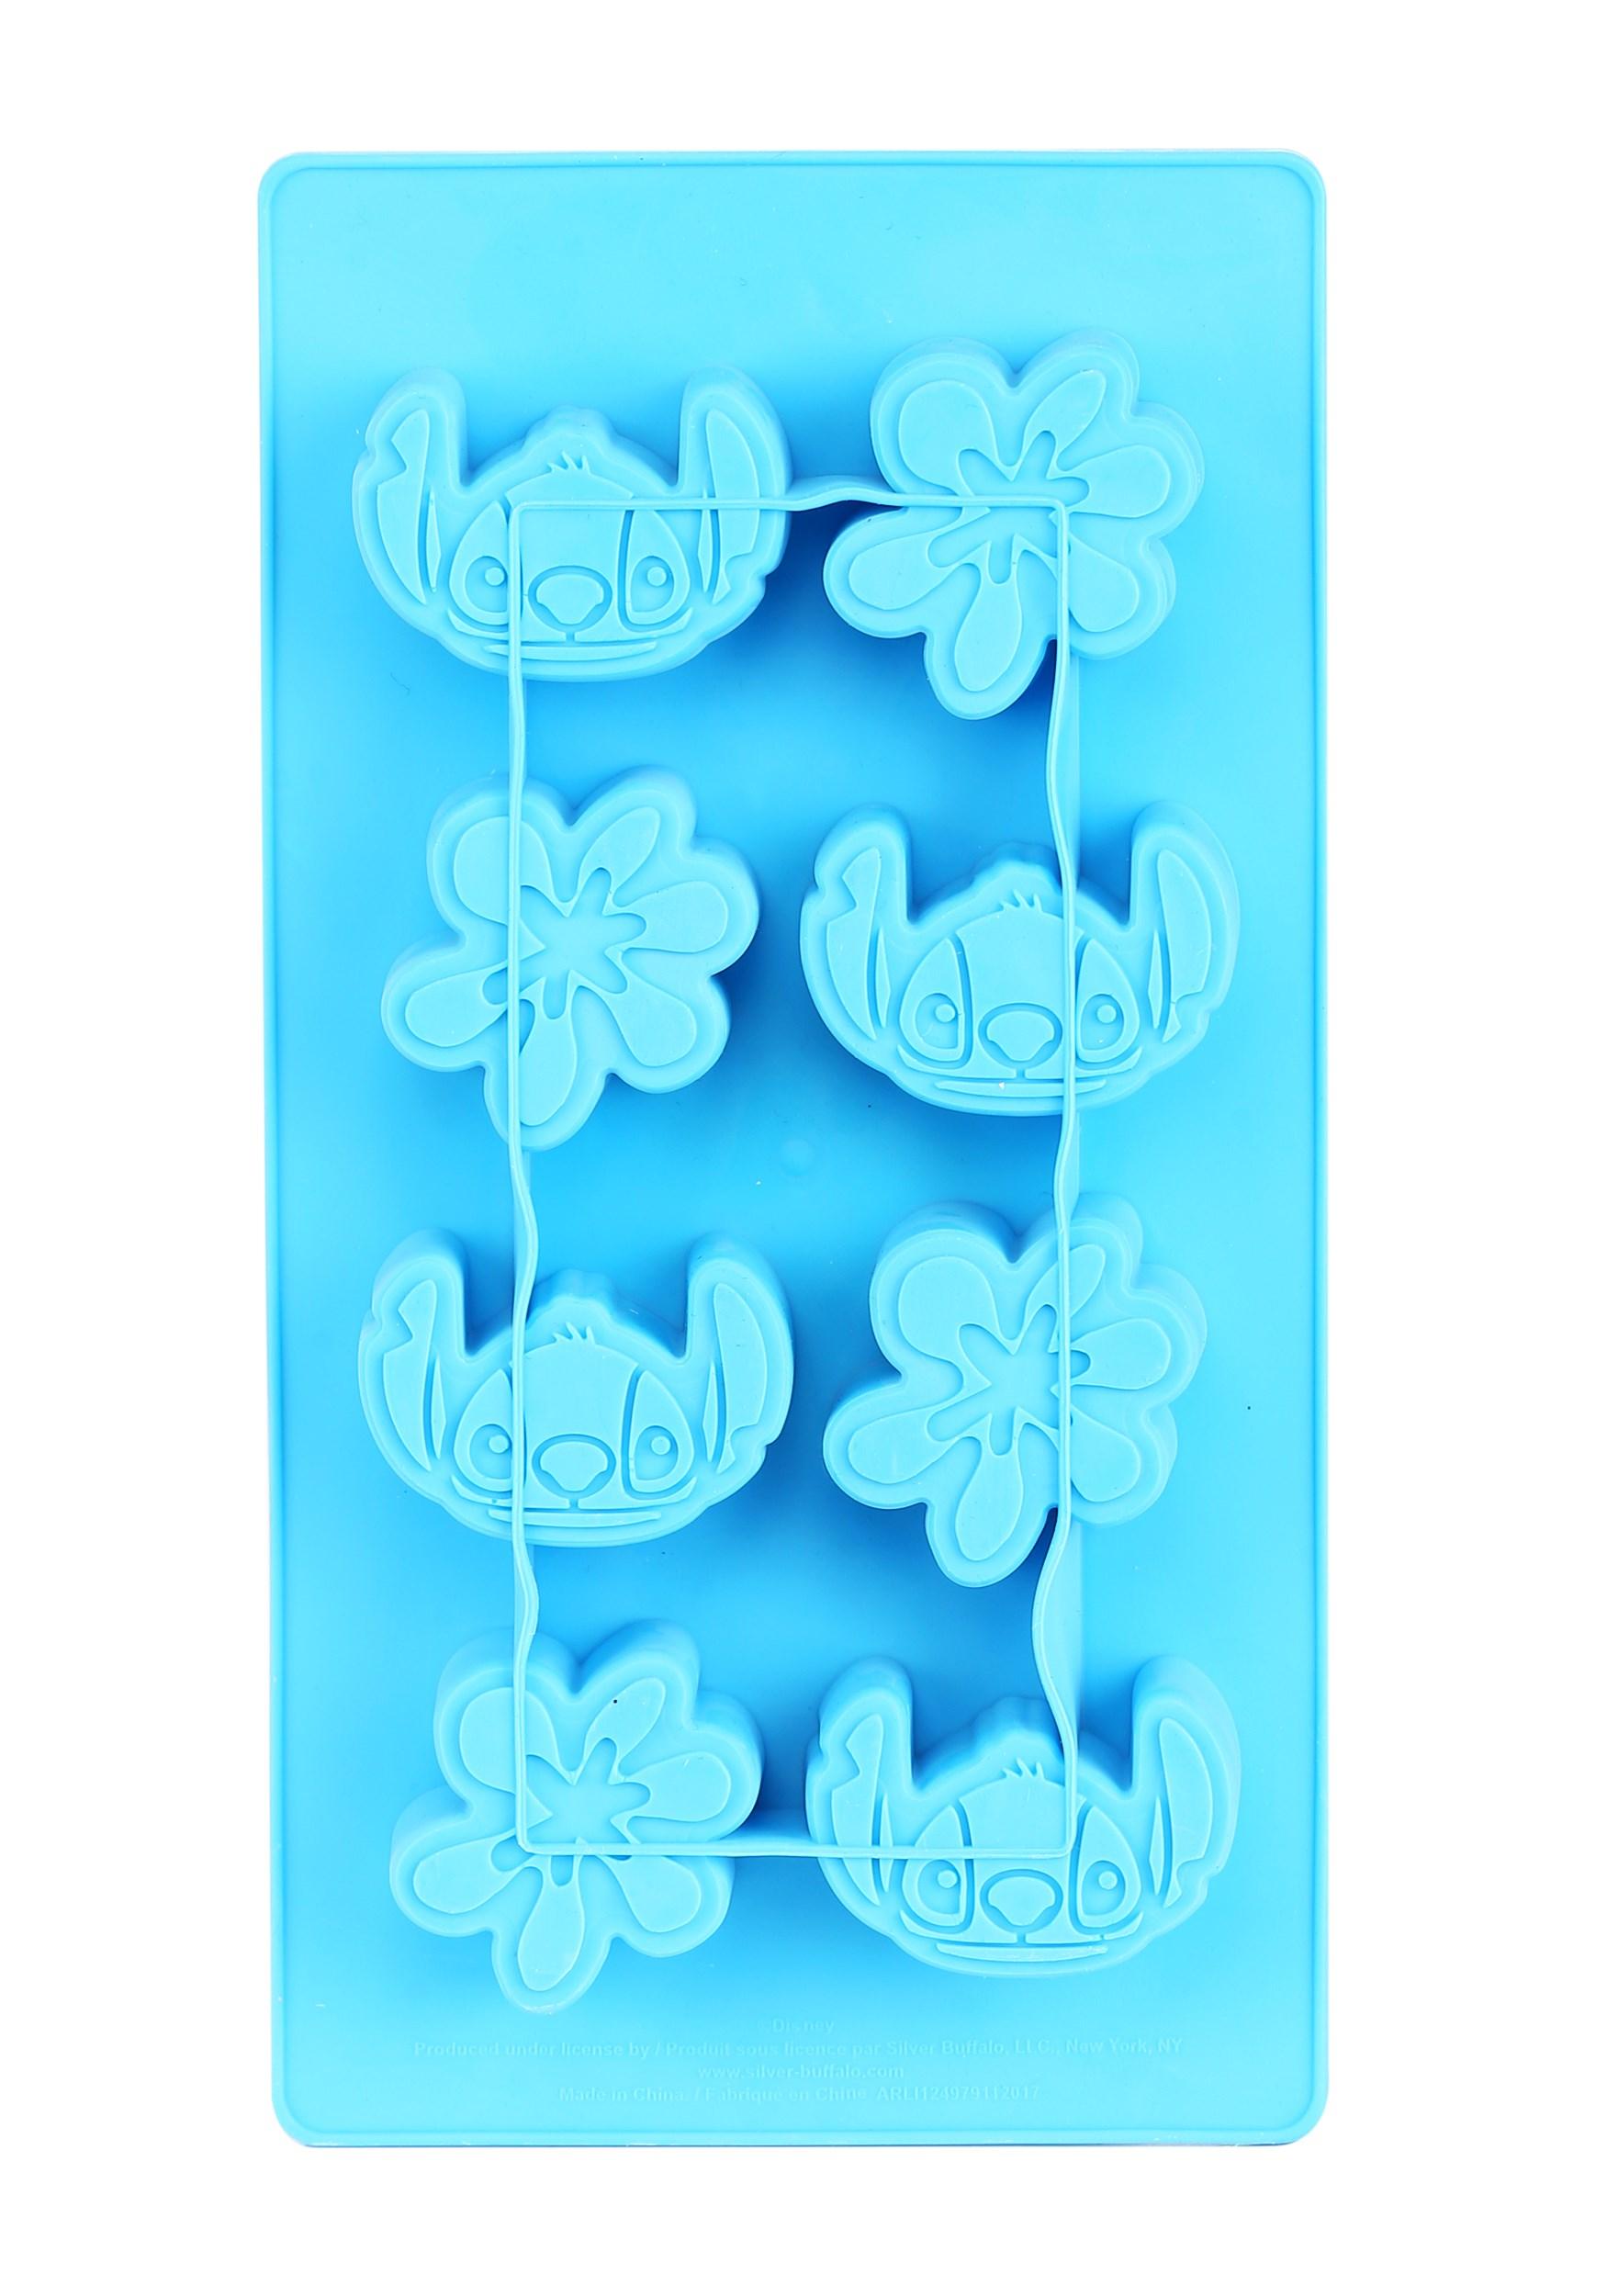 Lilo and Stitch Ice Cube Tray w/ Flowers